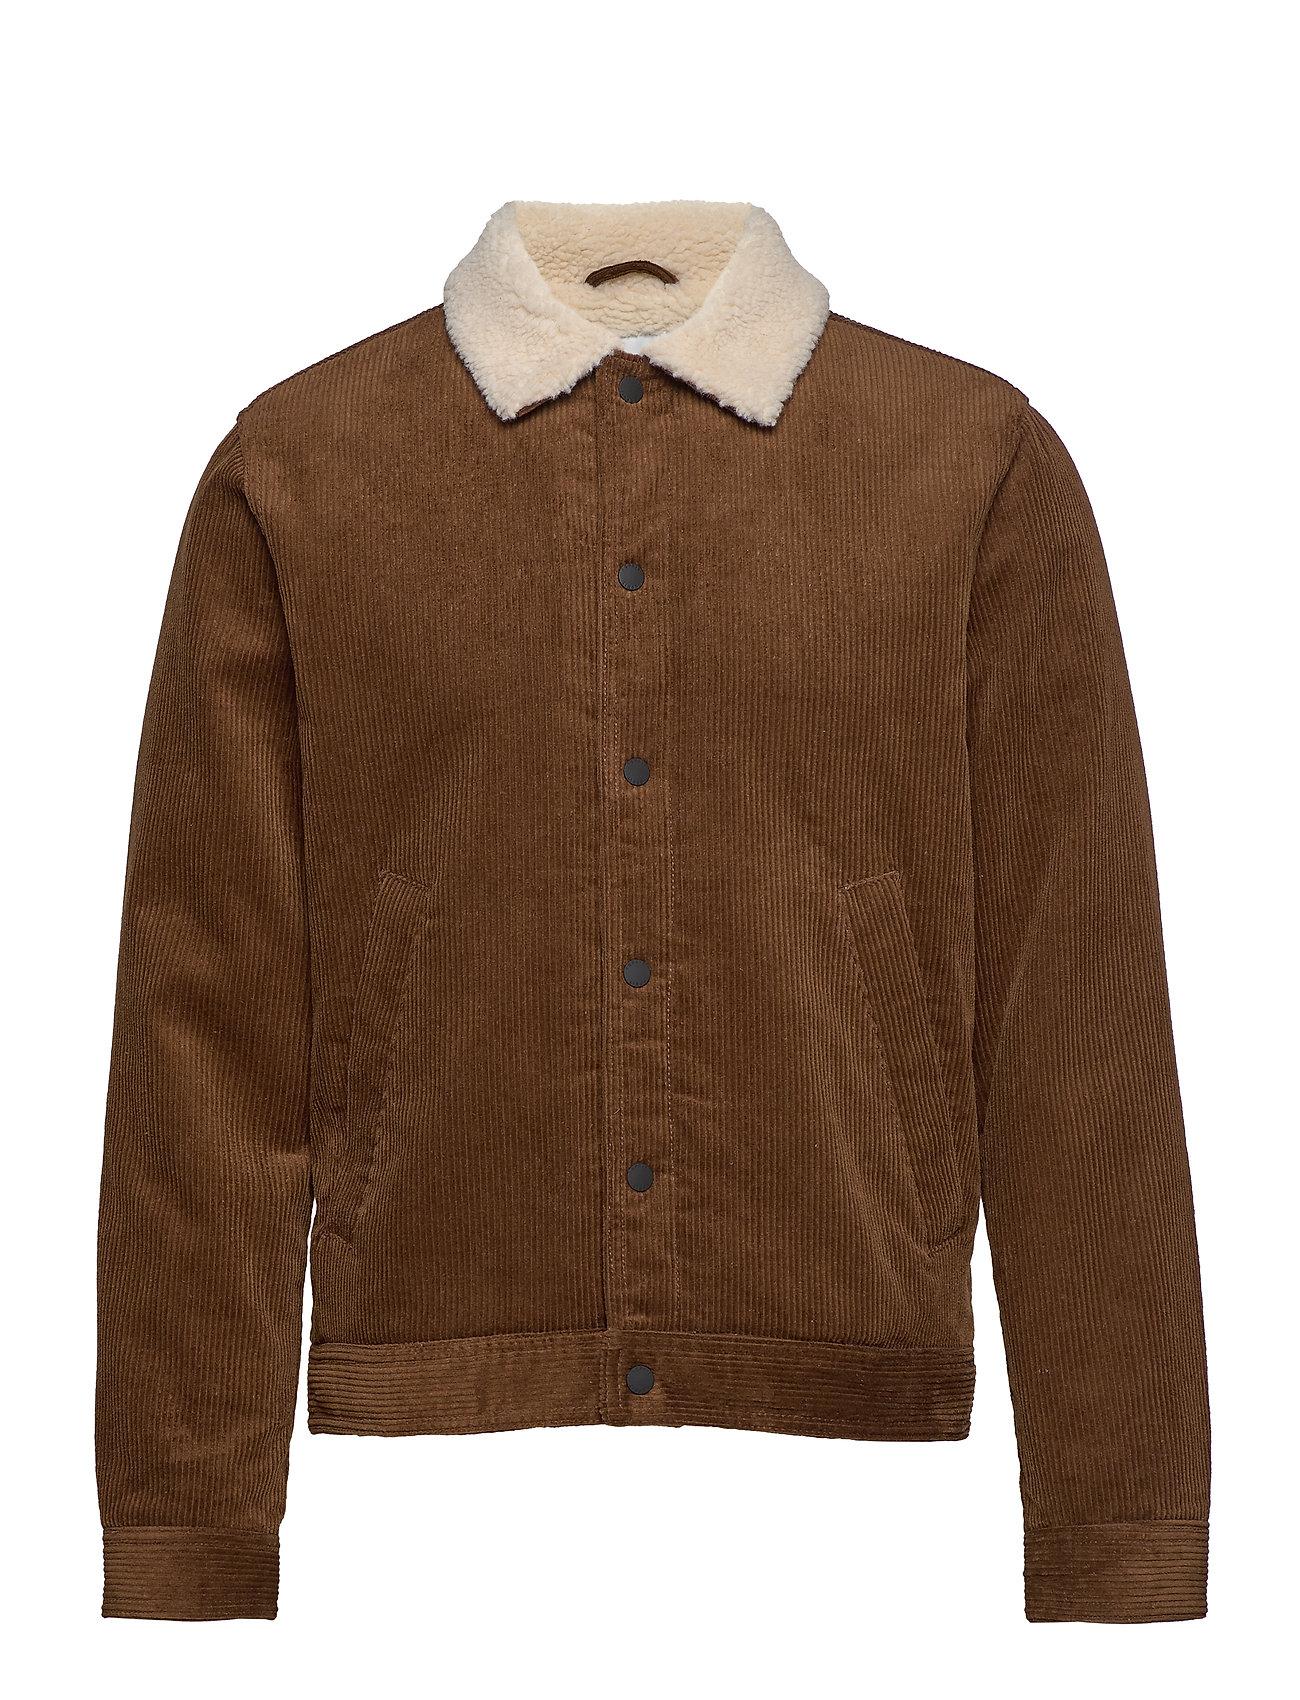 ESPRIT Jackets Outdoor Woven Jeansjacke Denimjacke Braun ESPRIT CASUAL